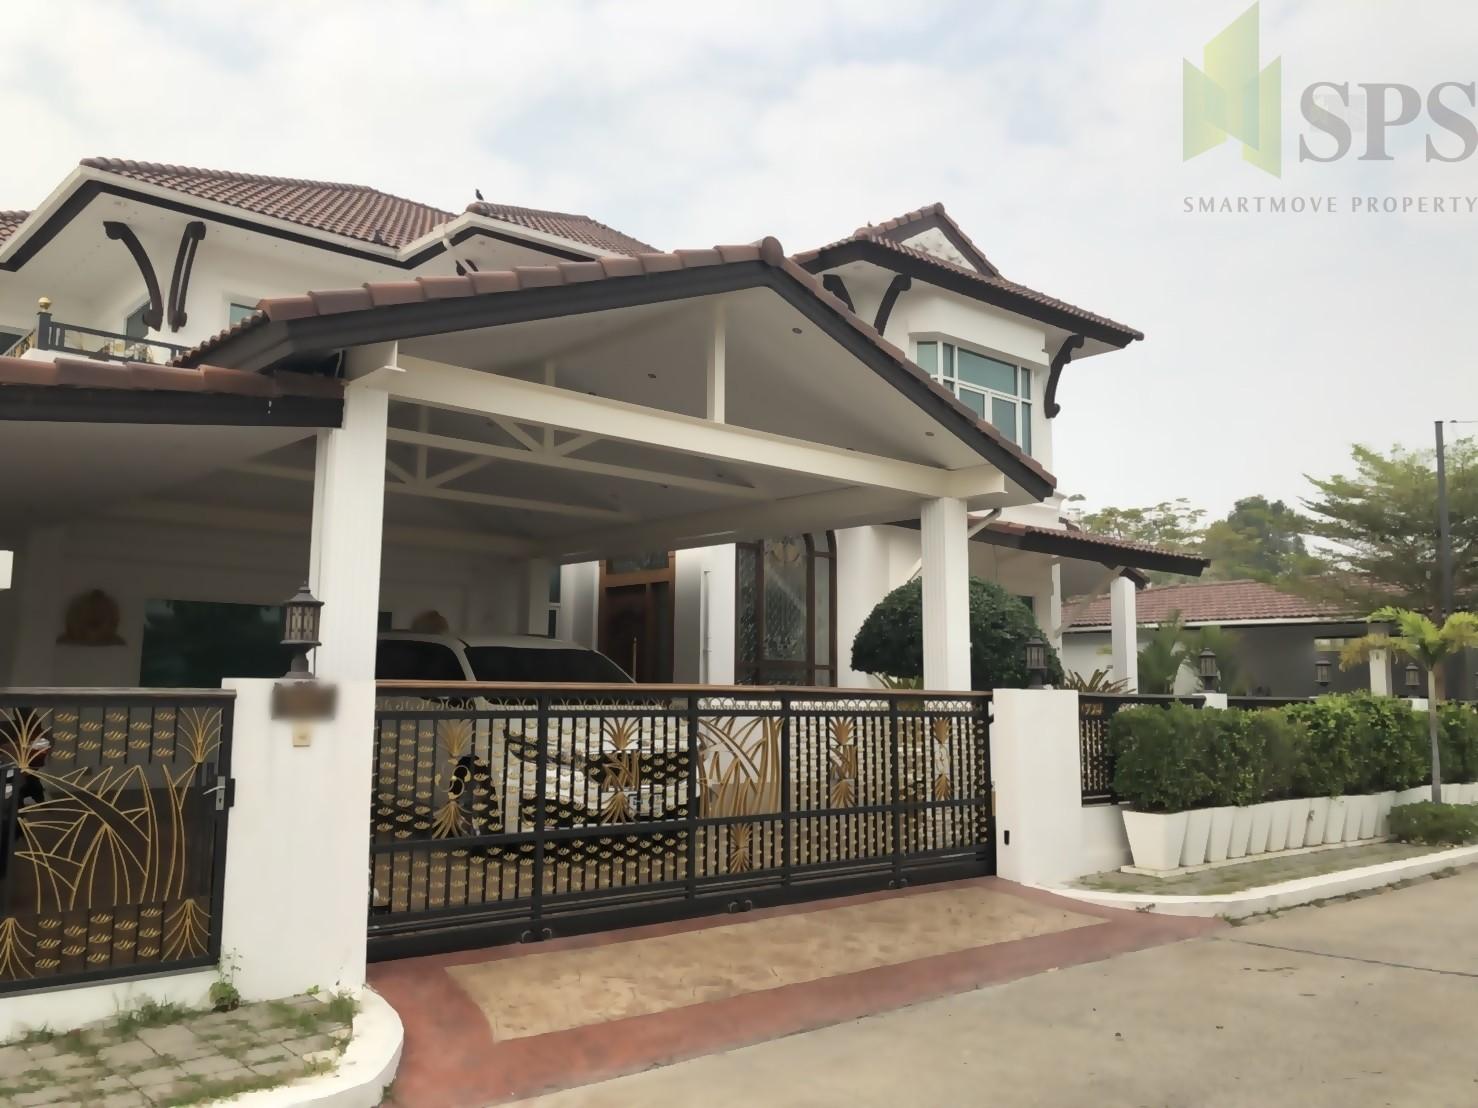 For Sale Single House 5 bedrooms Anaville-Suvarnhabhumi (SPS- SPS-GH122)